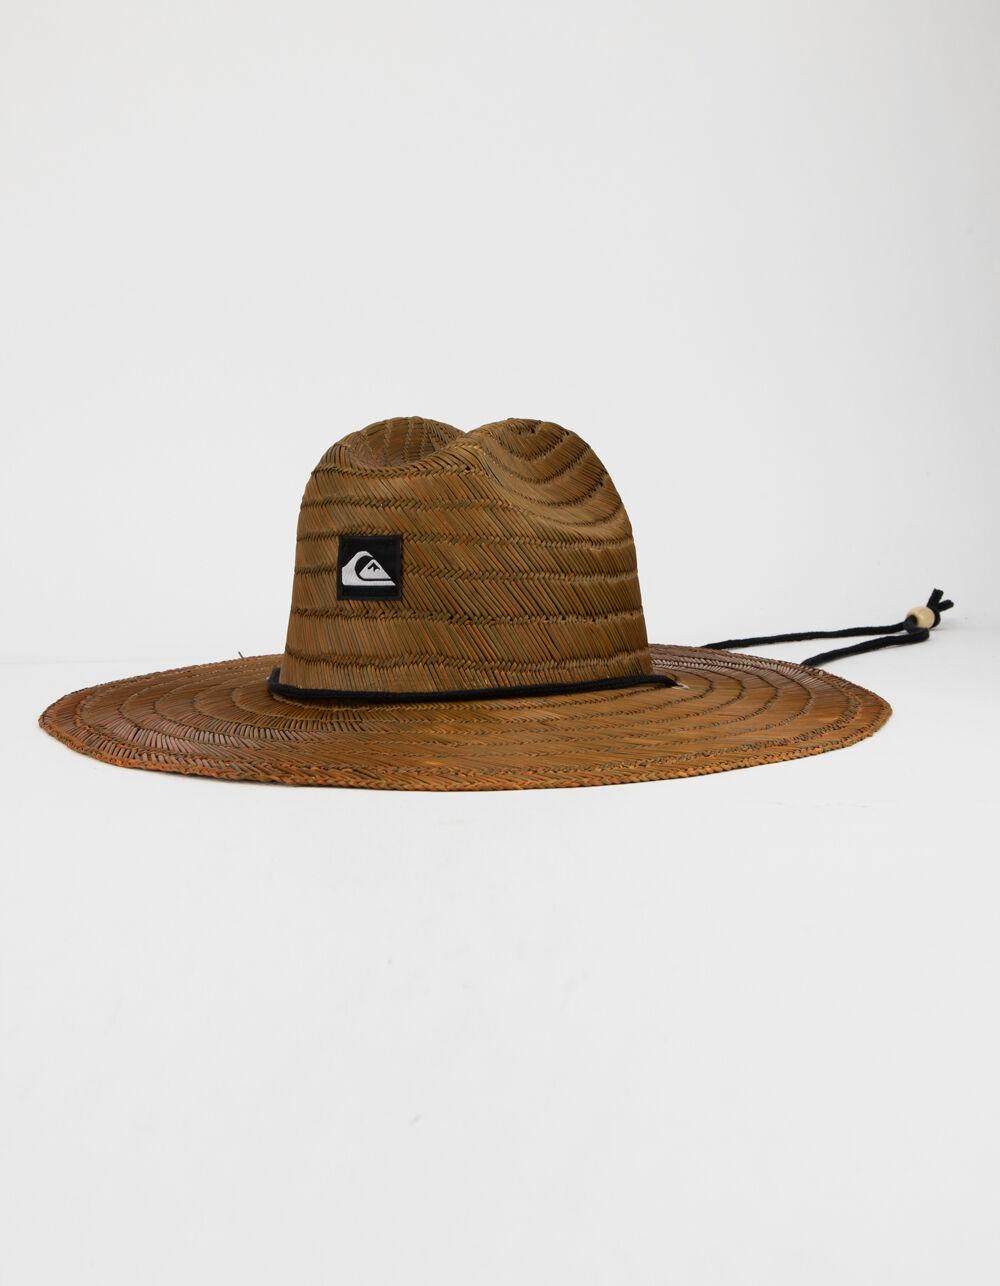 QUIKSILVER Pierside Brown Lifeguard Straw Hat